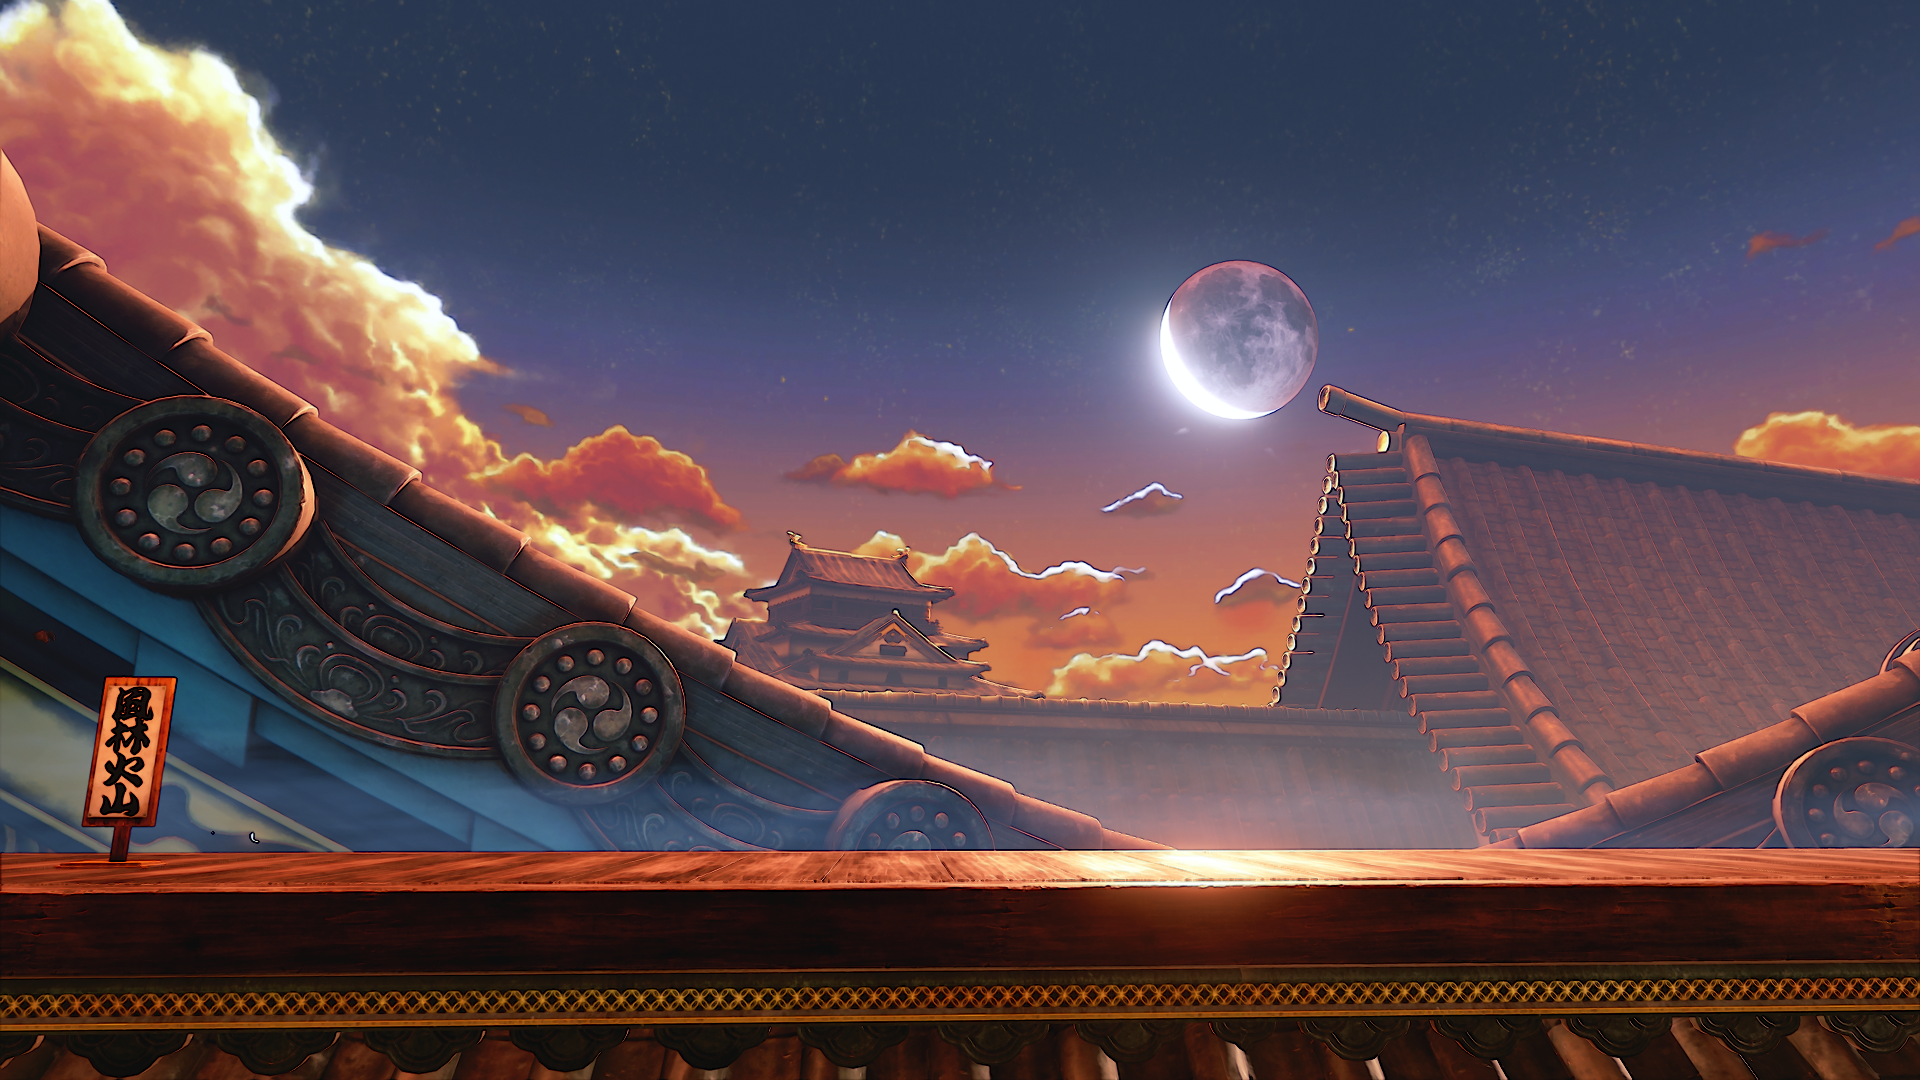 Street Fighter V گذشتهی غنیاش را با لباسها و استیجهای جدید، جشن خواهد گرفت